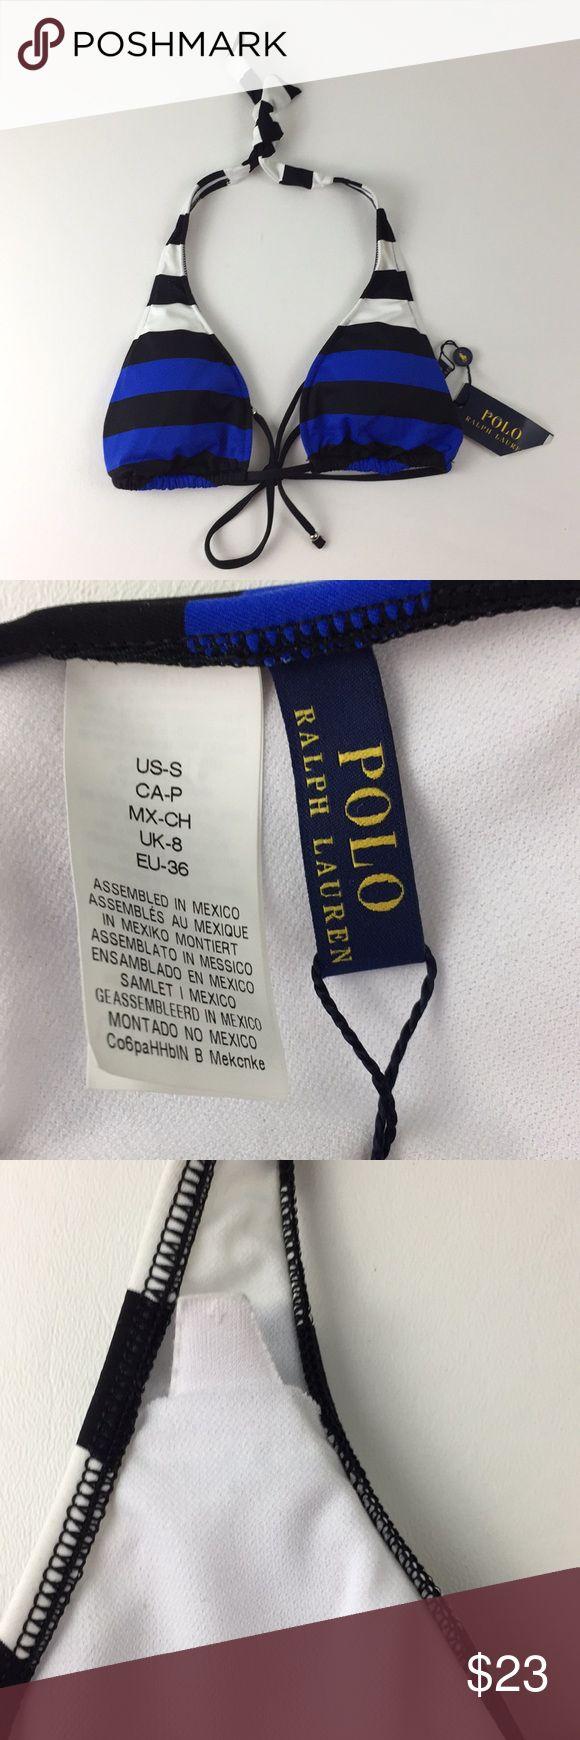 Polo Ralph Lauren Bikini Top.   B1 NWT Polo Ralph Lauren Triangle Bikini Top. Women's Size small. Removable foam padding. Black, blue and white stripes. Back tie has silver bead on the ends. 83% nylon, 17% elastane. Polo by Ralph Lauren Swim Bikinis